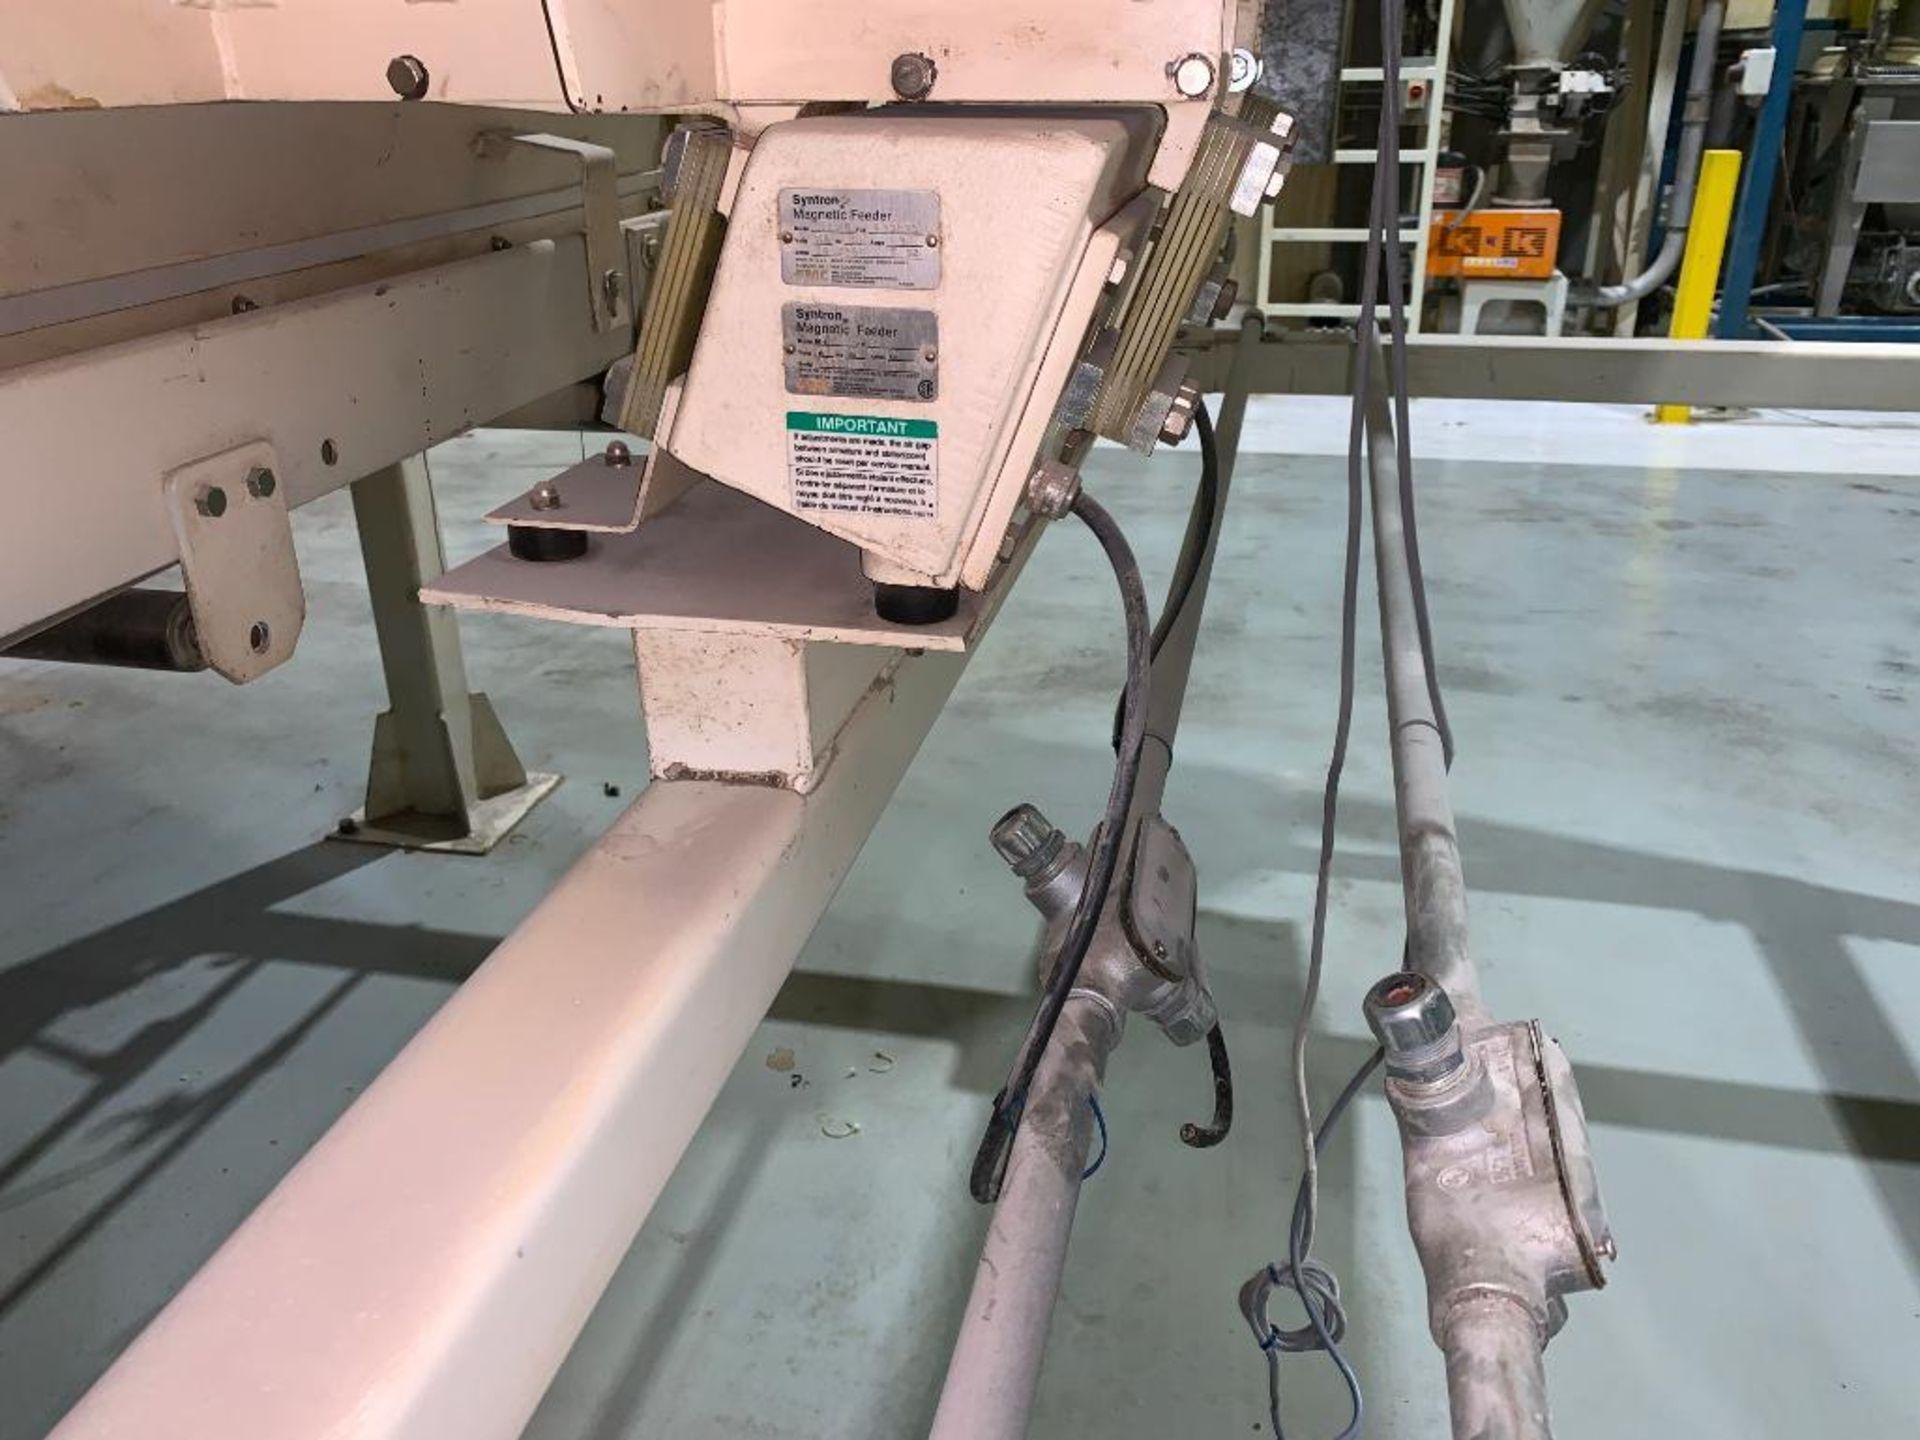 Aseeco mild steel cone bottom bulk storage bin - Image 8 of 16